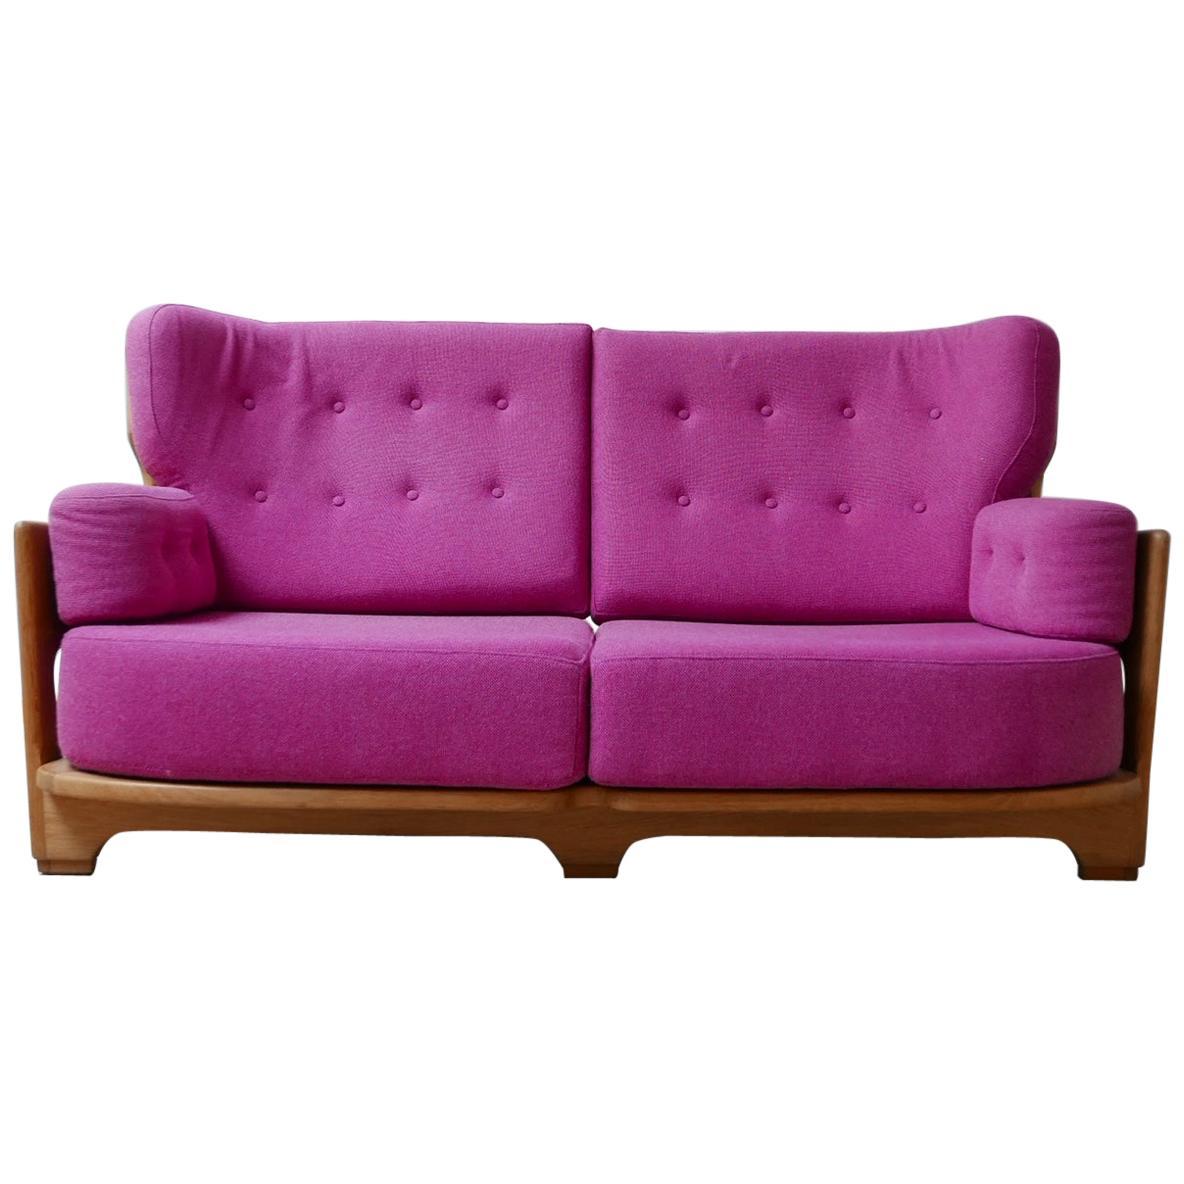 Guillerme et Chambron Oak Midcentury Sofa